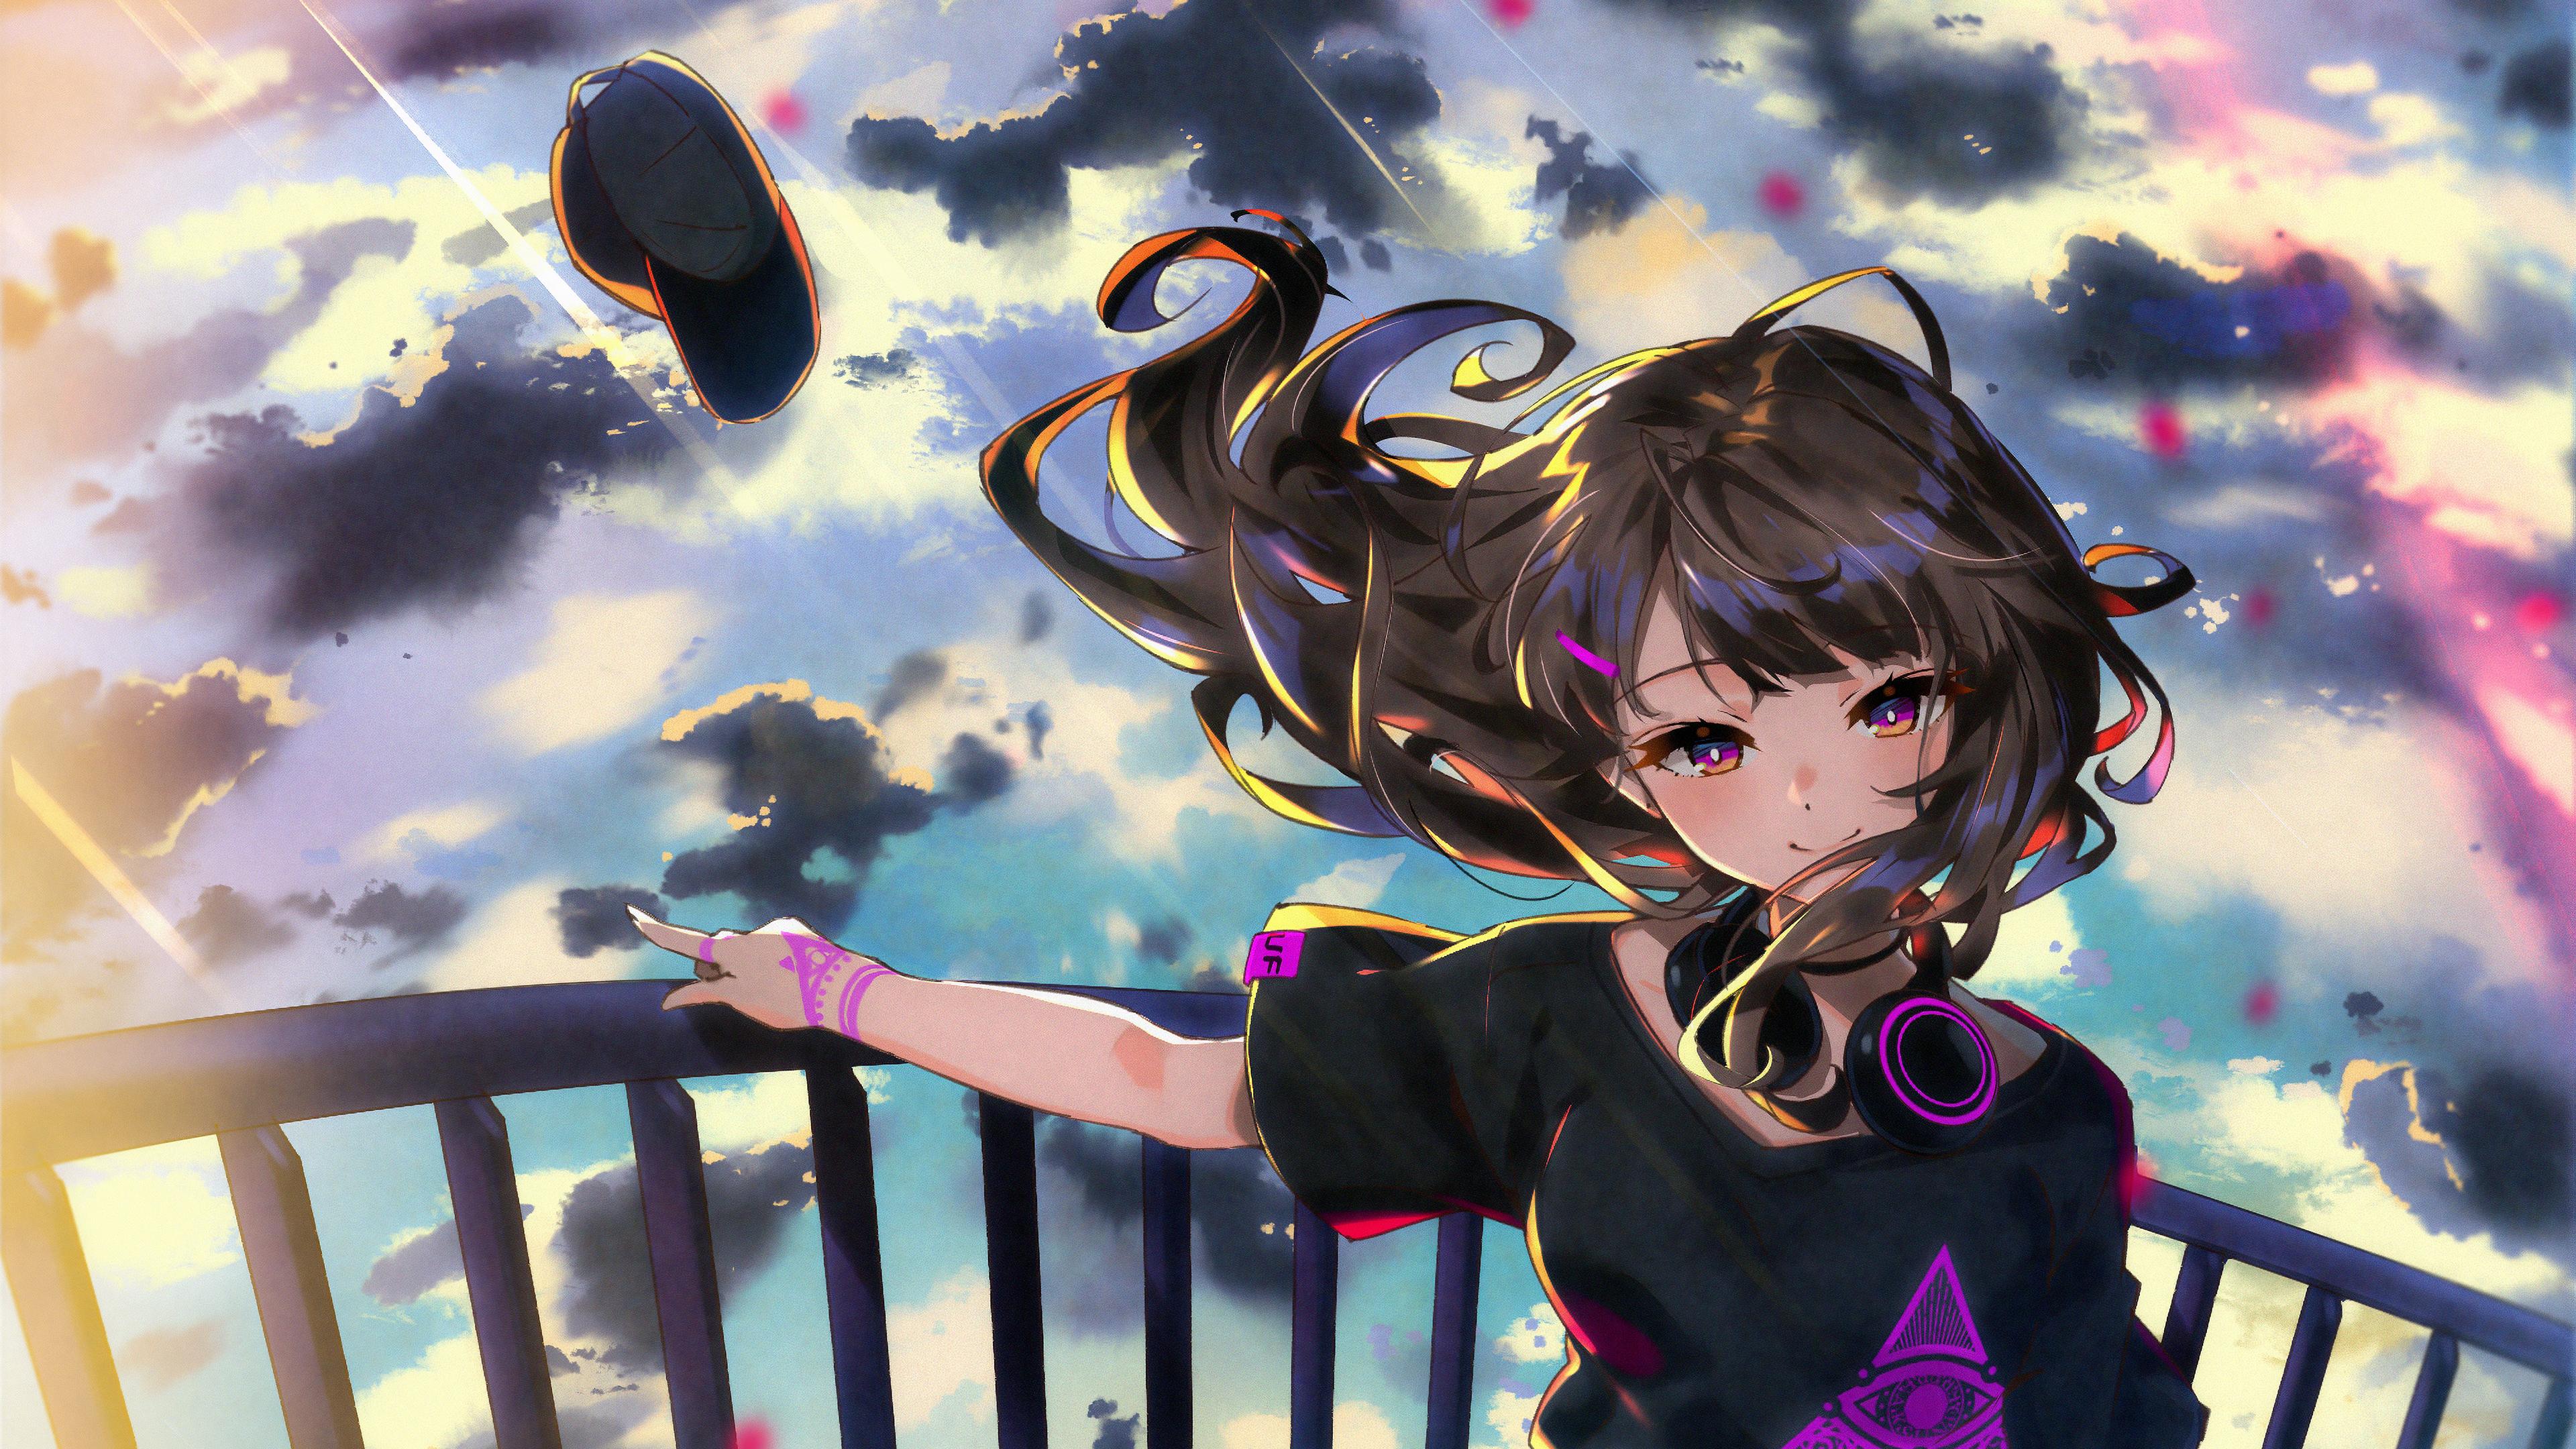 Anime Girl Standing At Height 4k Hd Anime 4k Wallpapers